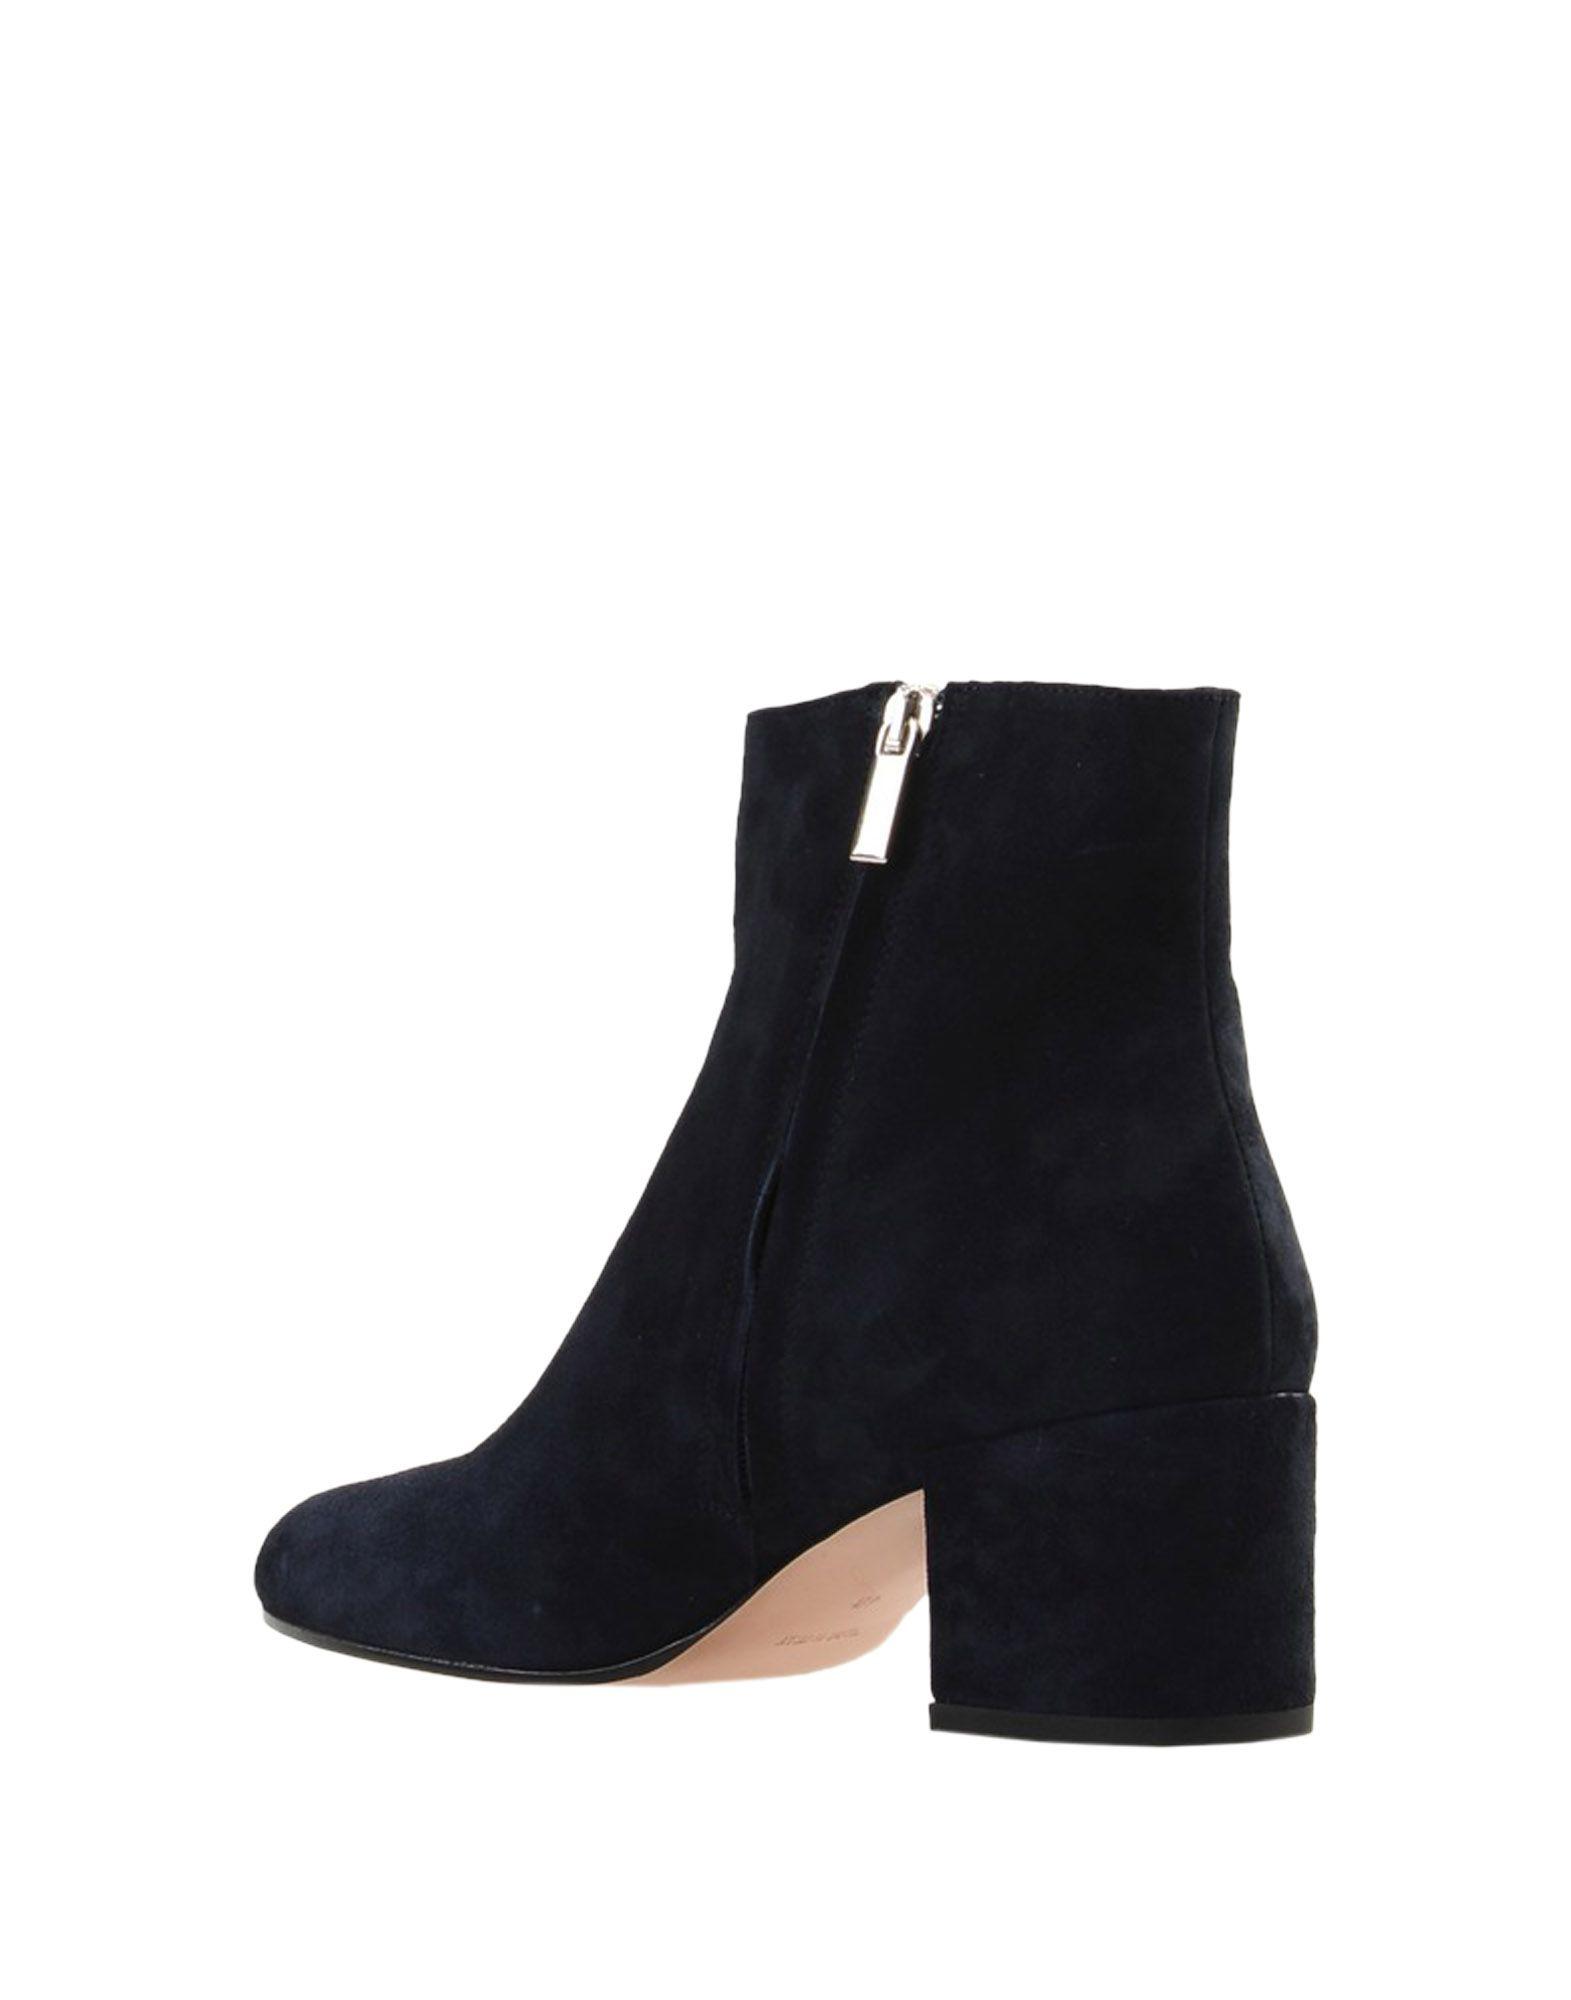 Stilvolle billige Schuhe Bianca 11572143BG Di Stiefelette Damen  11572143BG Bianca 7f7867